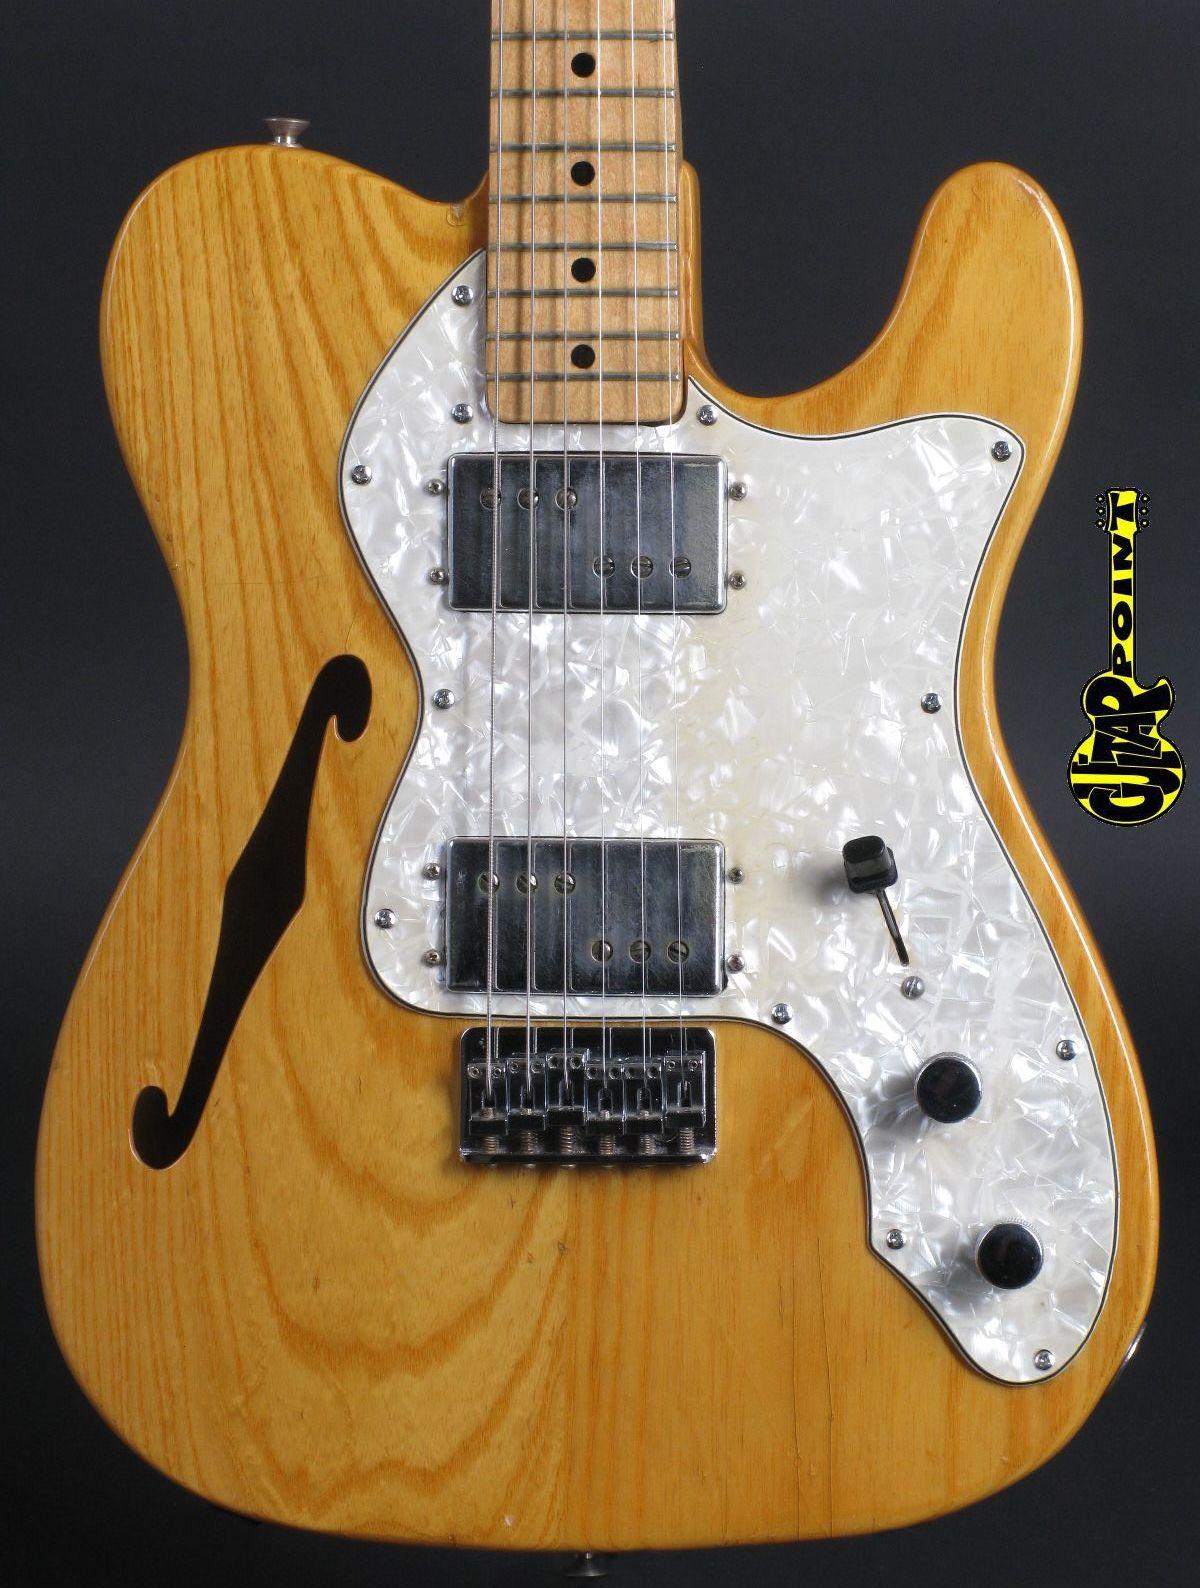 1973 Fender Telecaster Thinline II - Natural